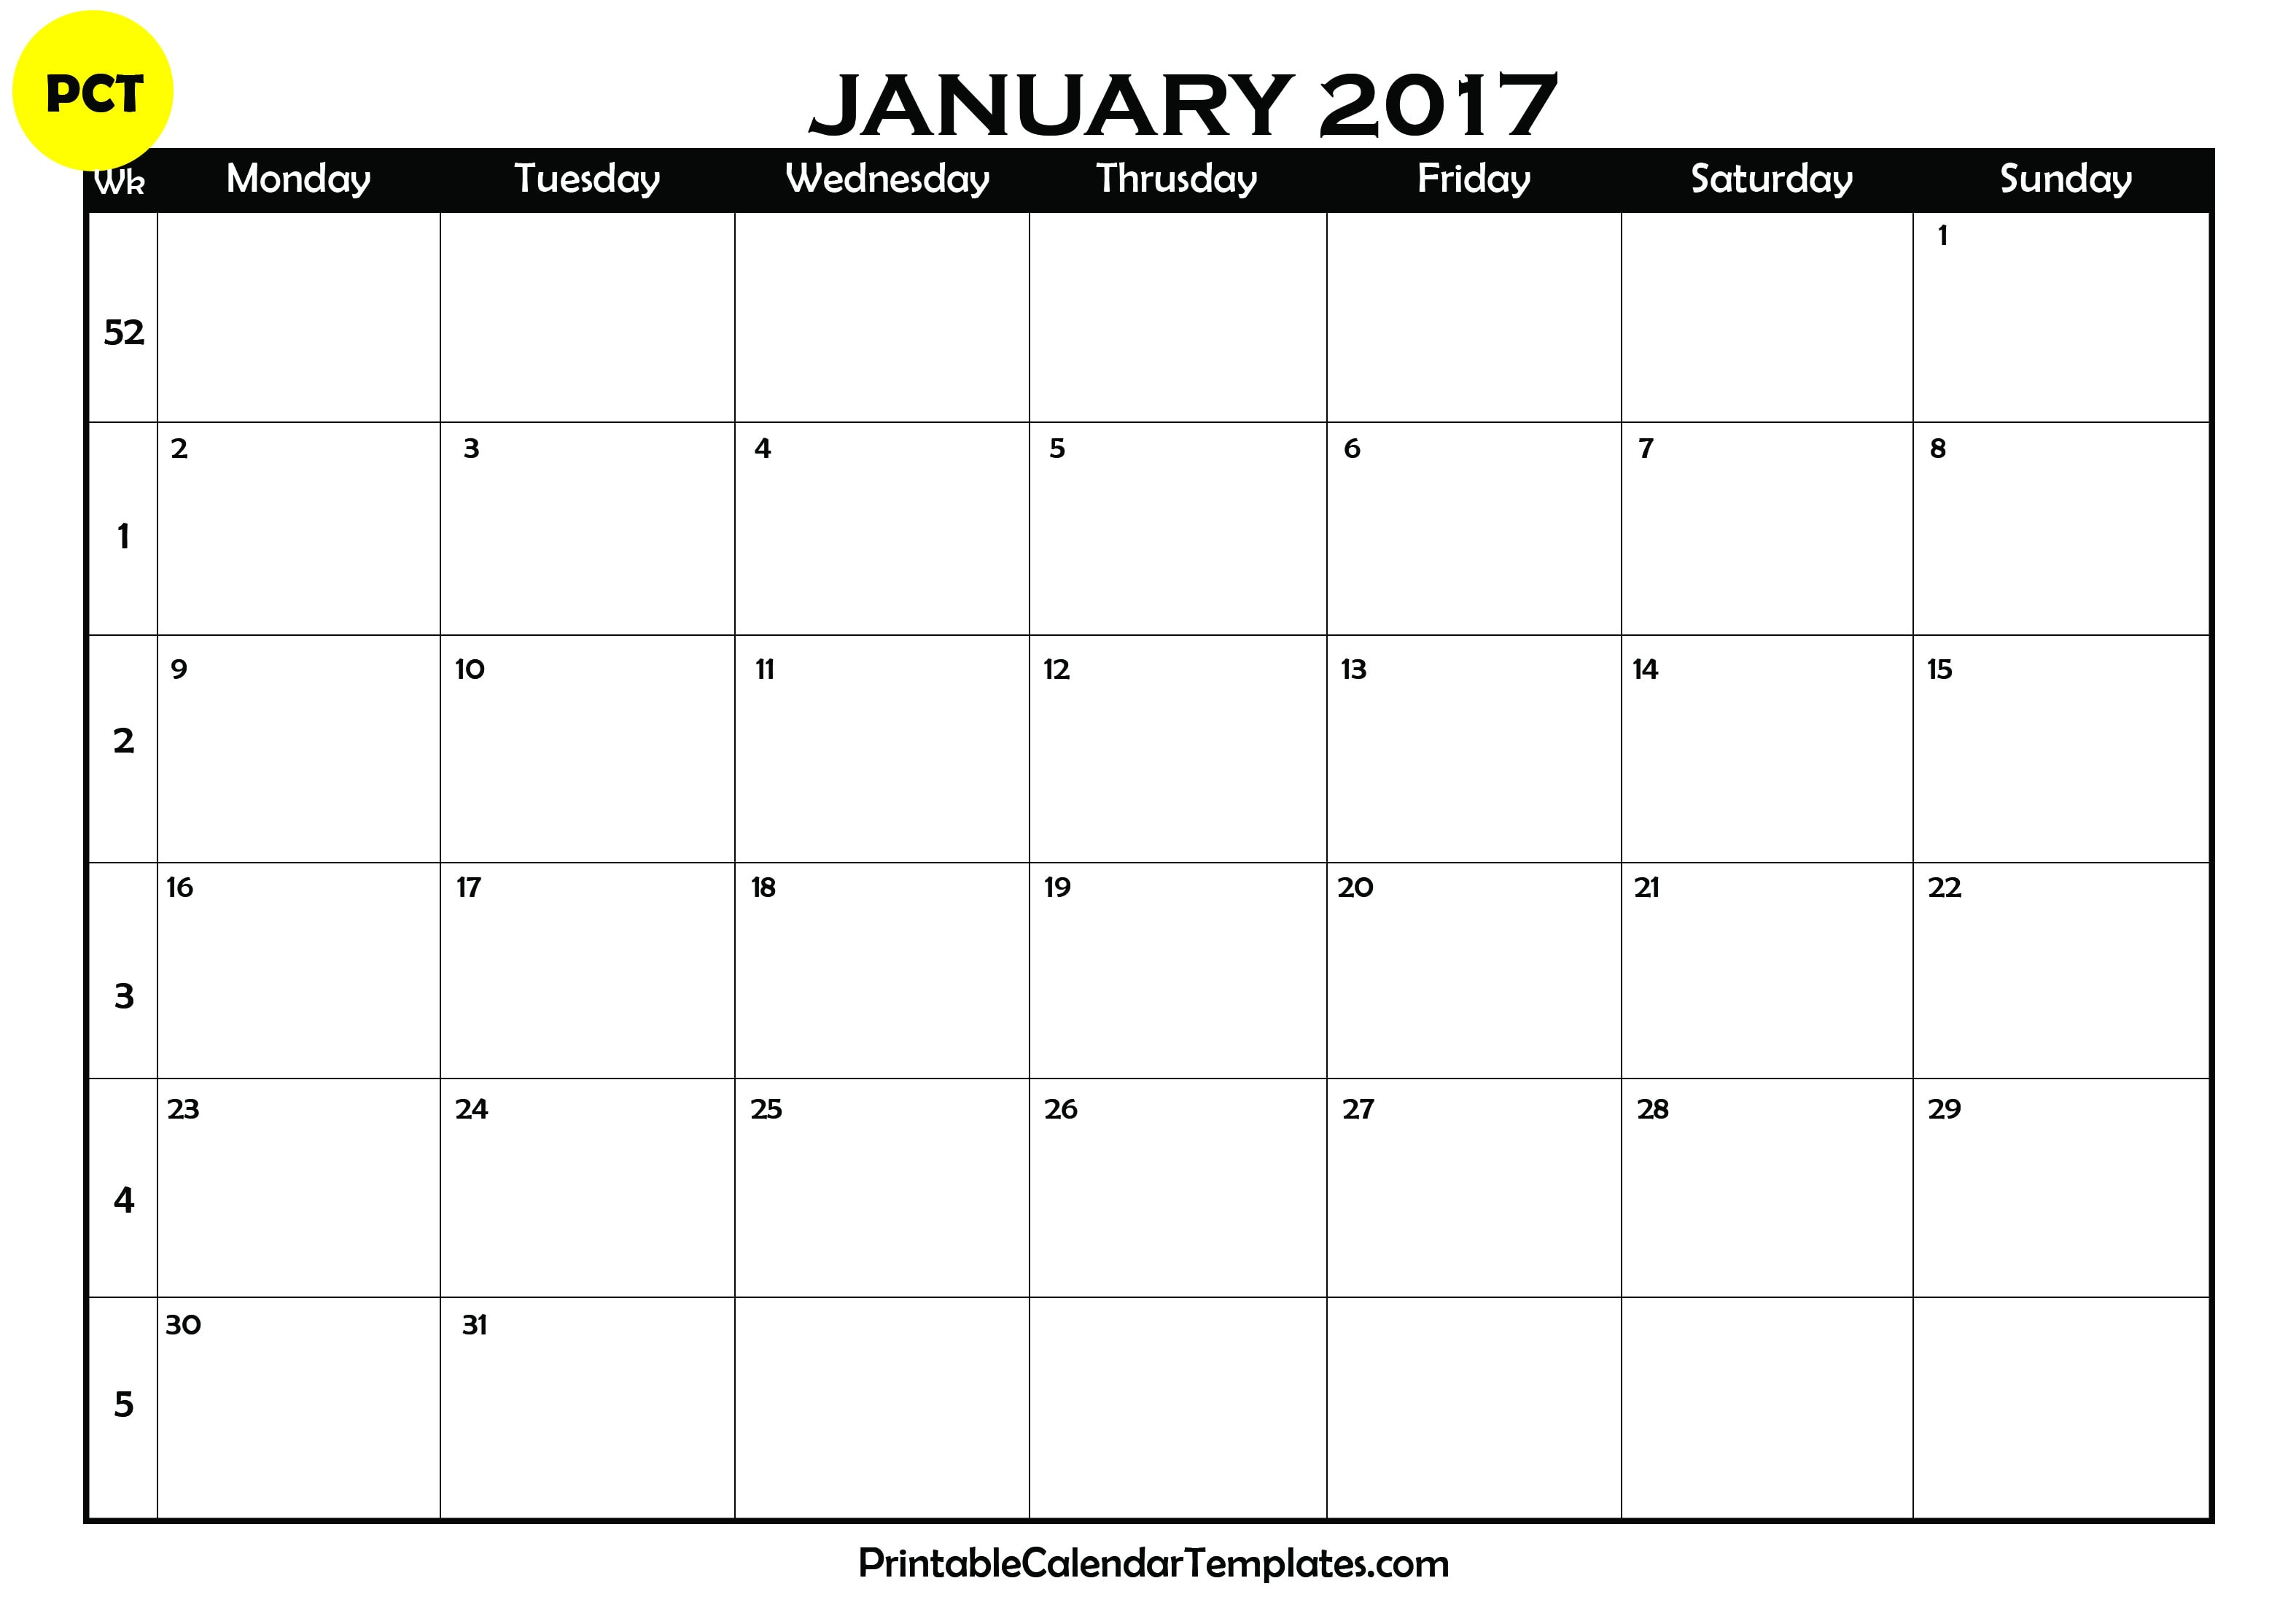 January 2017 printable calendar templates | Printable Calendar ...